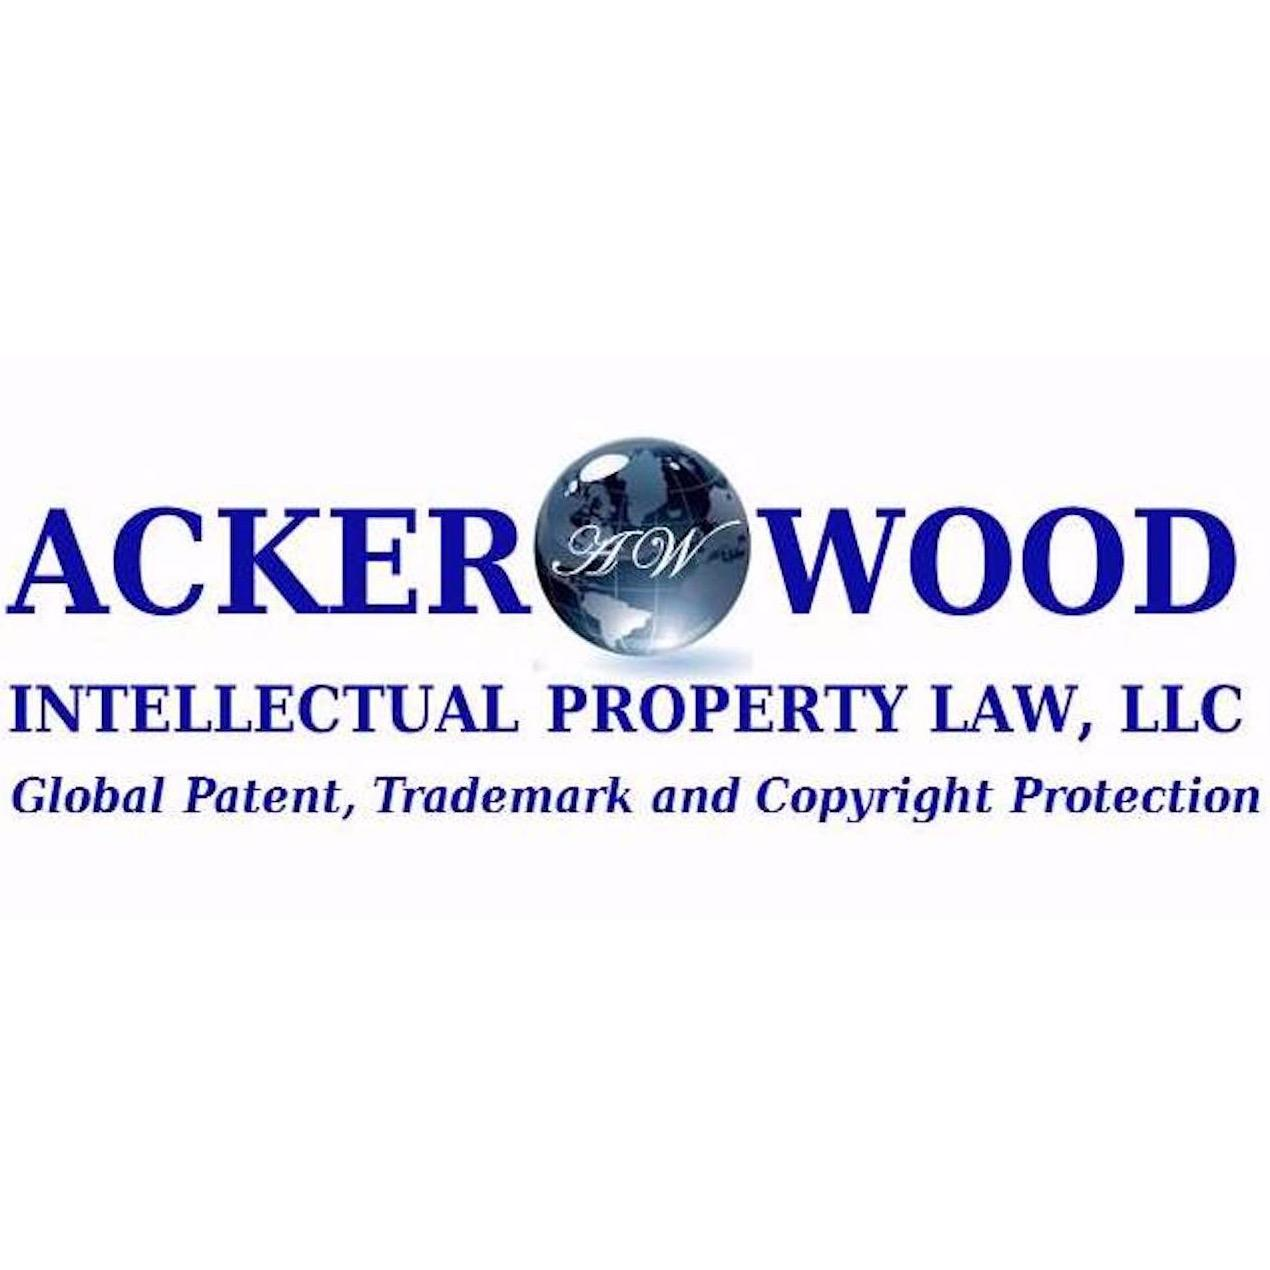 Acker Wood Intellectual Property Law, LLC